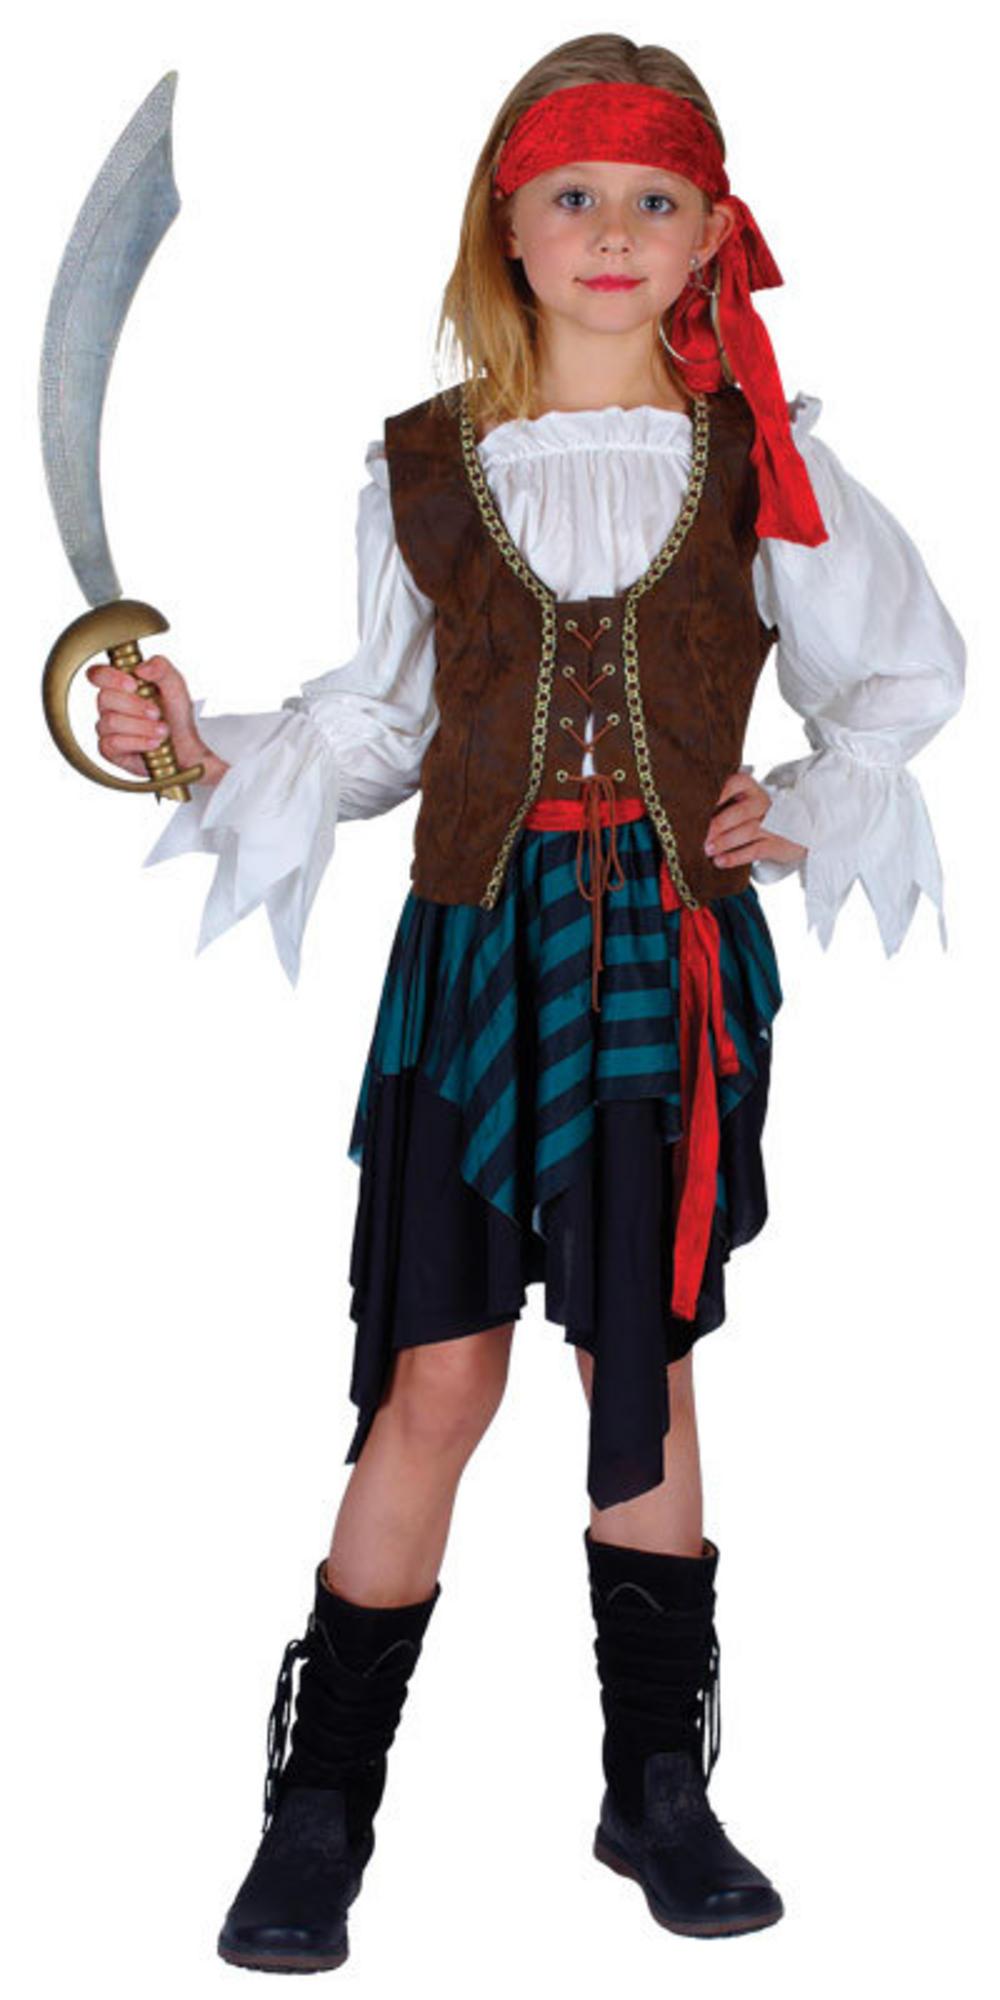 Girls' Caribbean Pirate Costume | Pirate Fancy Dress ... - photo#10